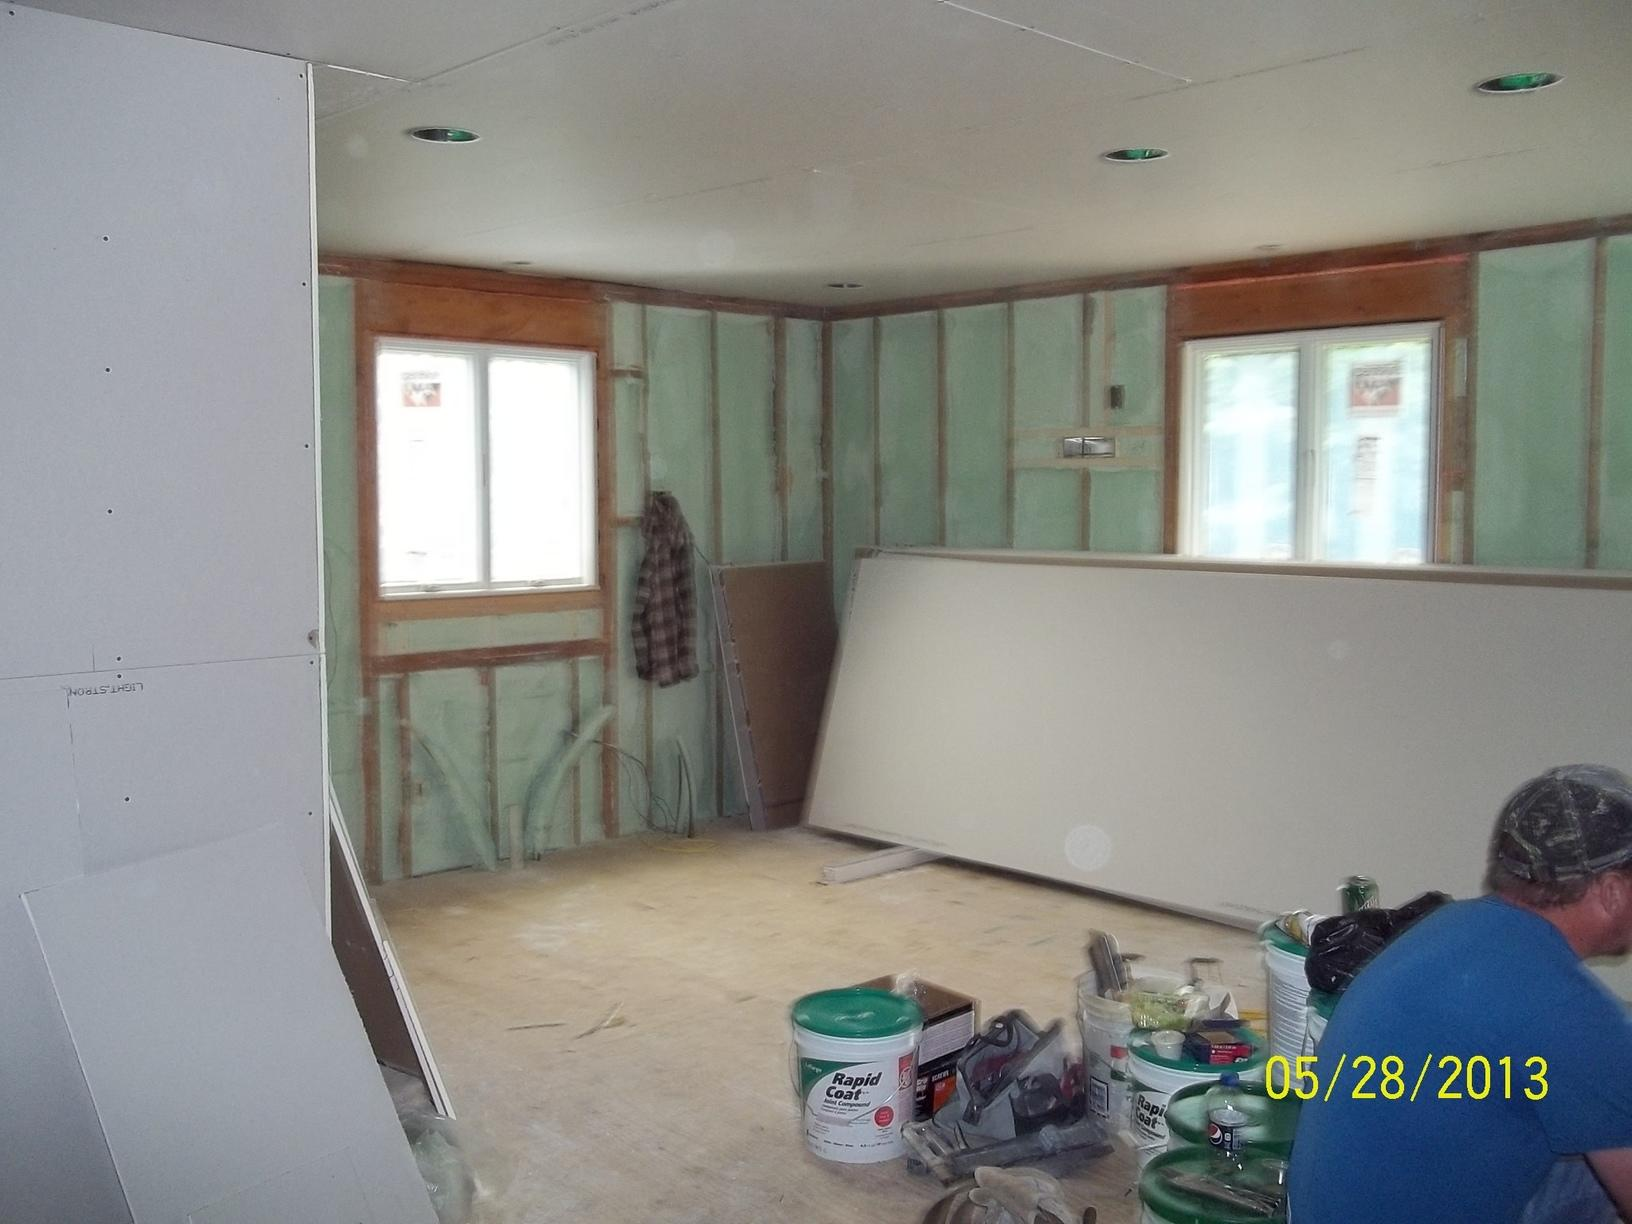 Spray Foam Installed Between Wall Studs